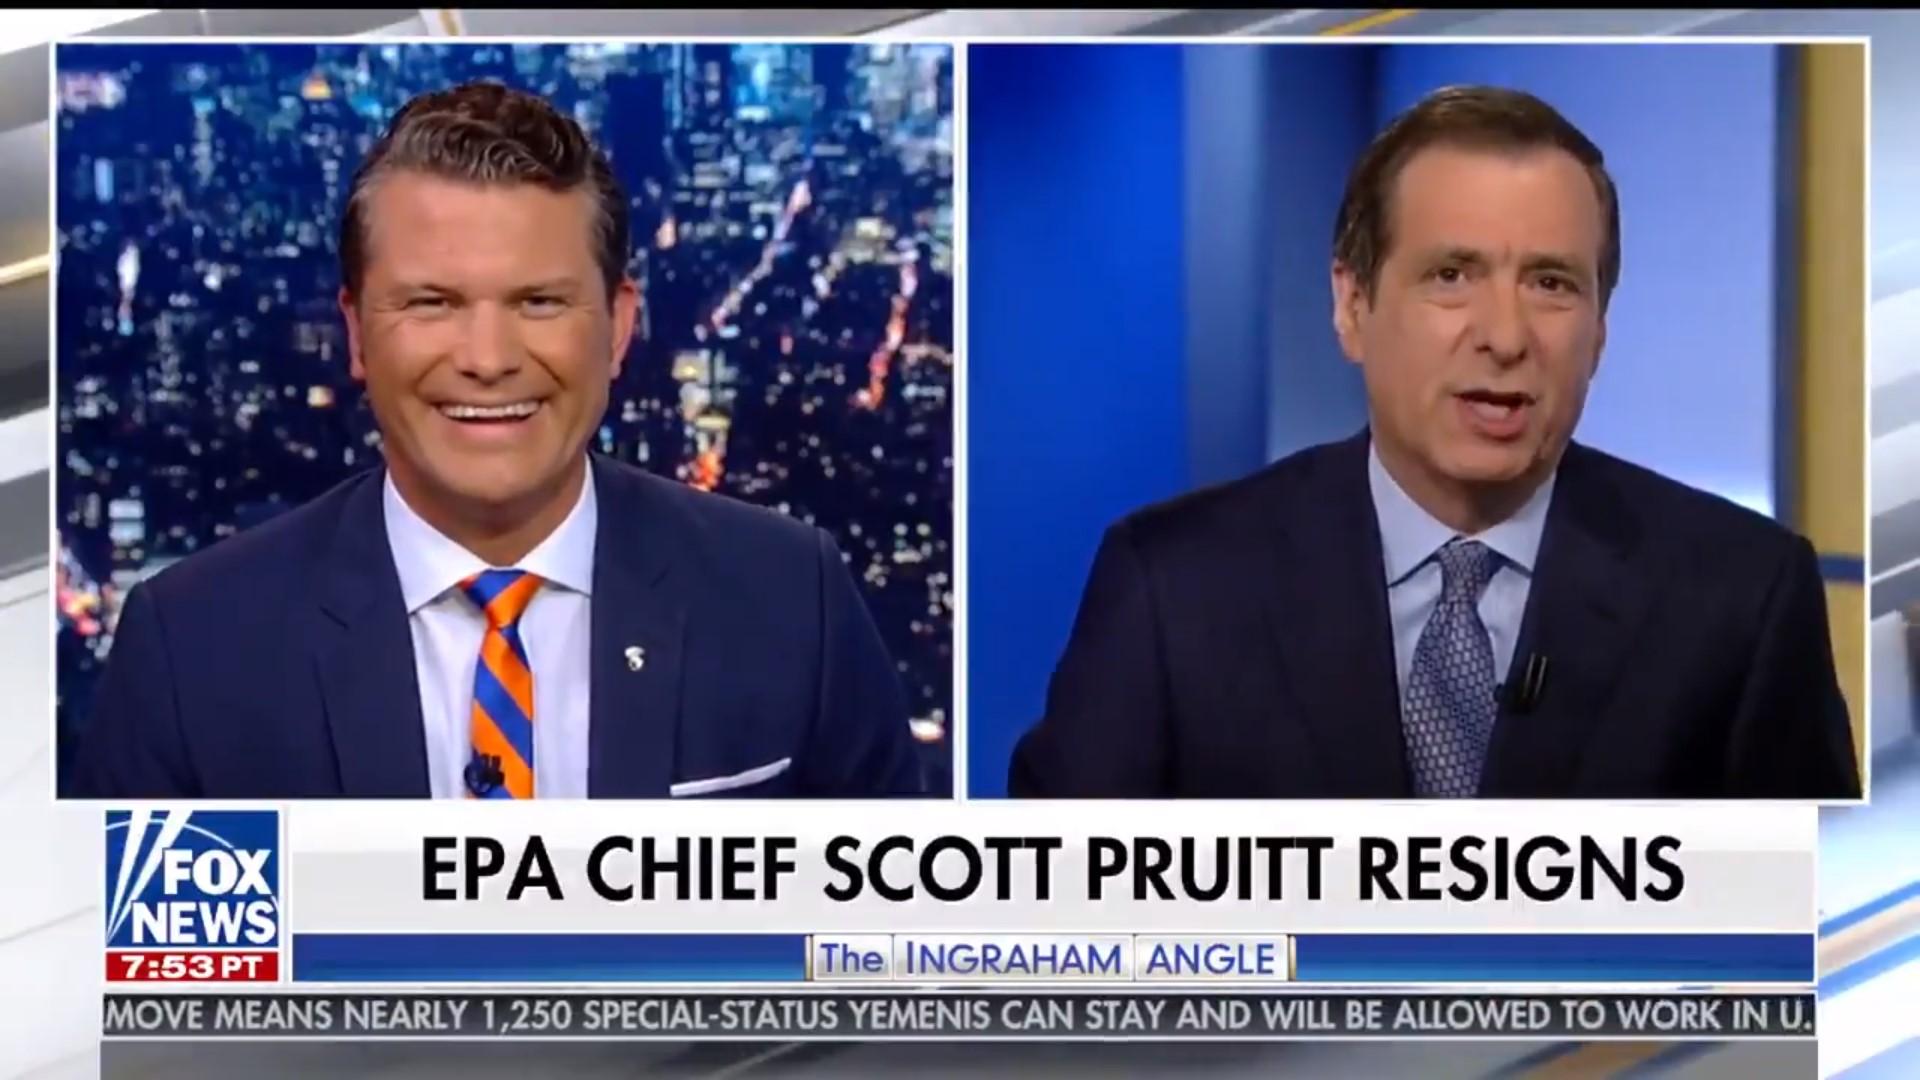 Fox News' Primetime Lineup Spent A Grand Total Of One Minute Covering Scott Pruitt's Resignation